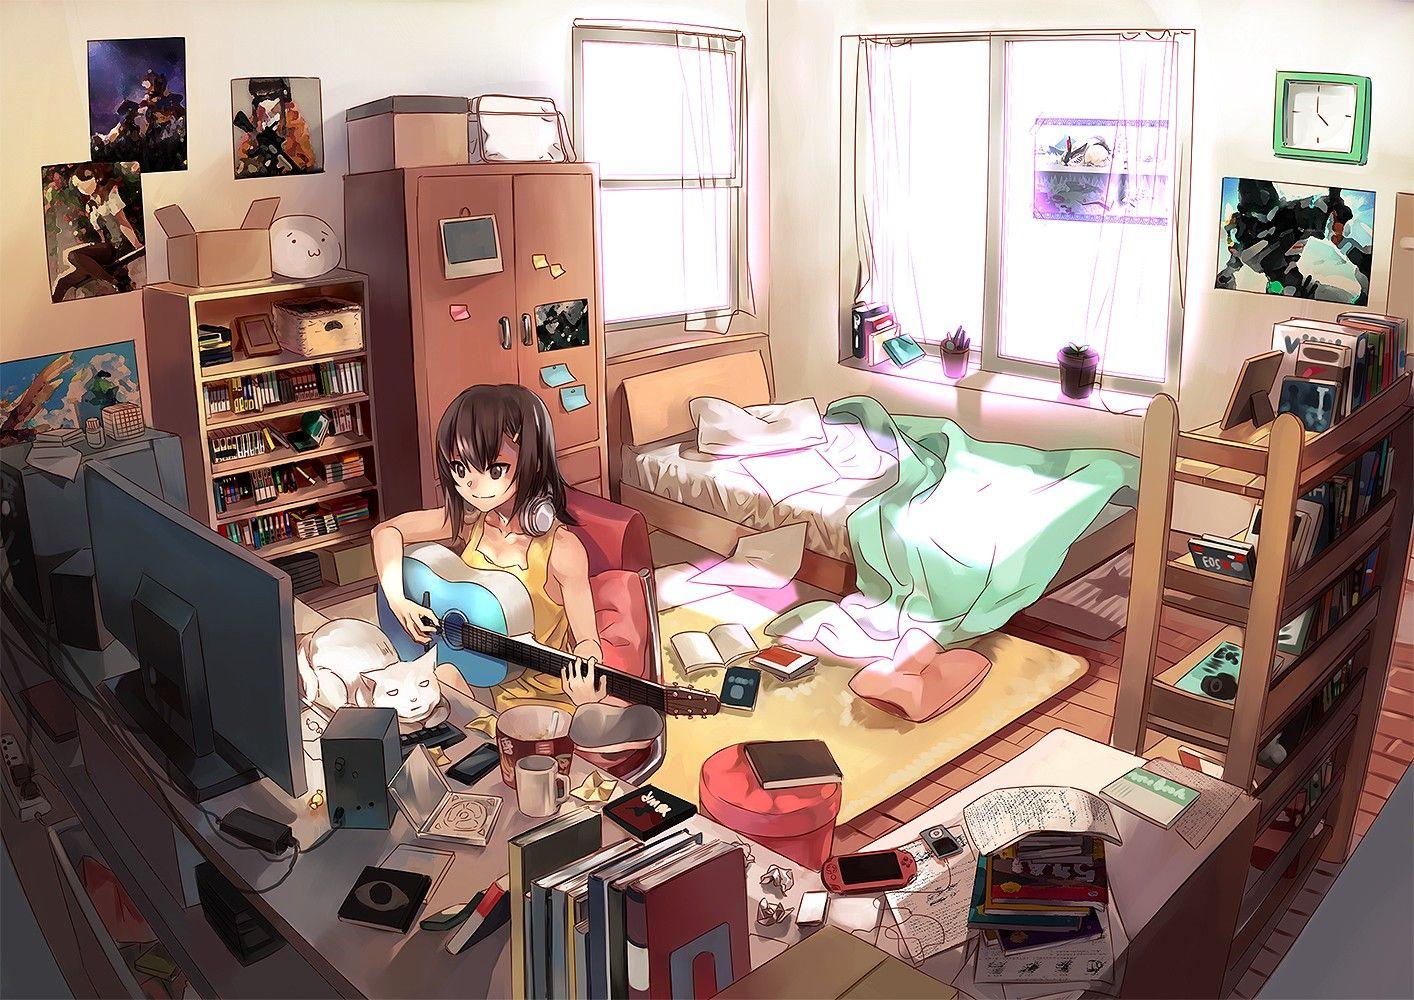 Girl Playing Guitar Wallpaper 1414x1000 Id 42466 Otaku Room Bedroom Drawing Anime Backgrounds Wallpapers